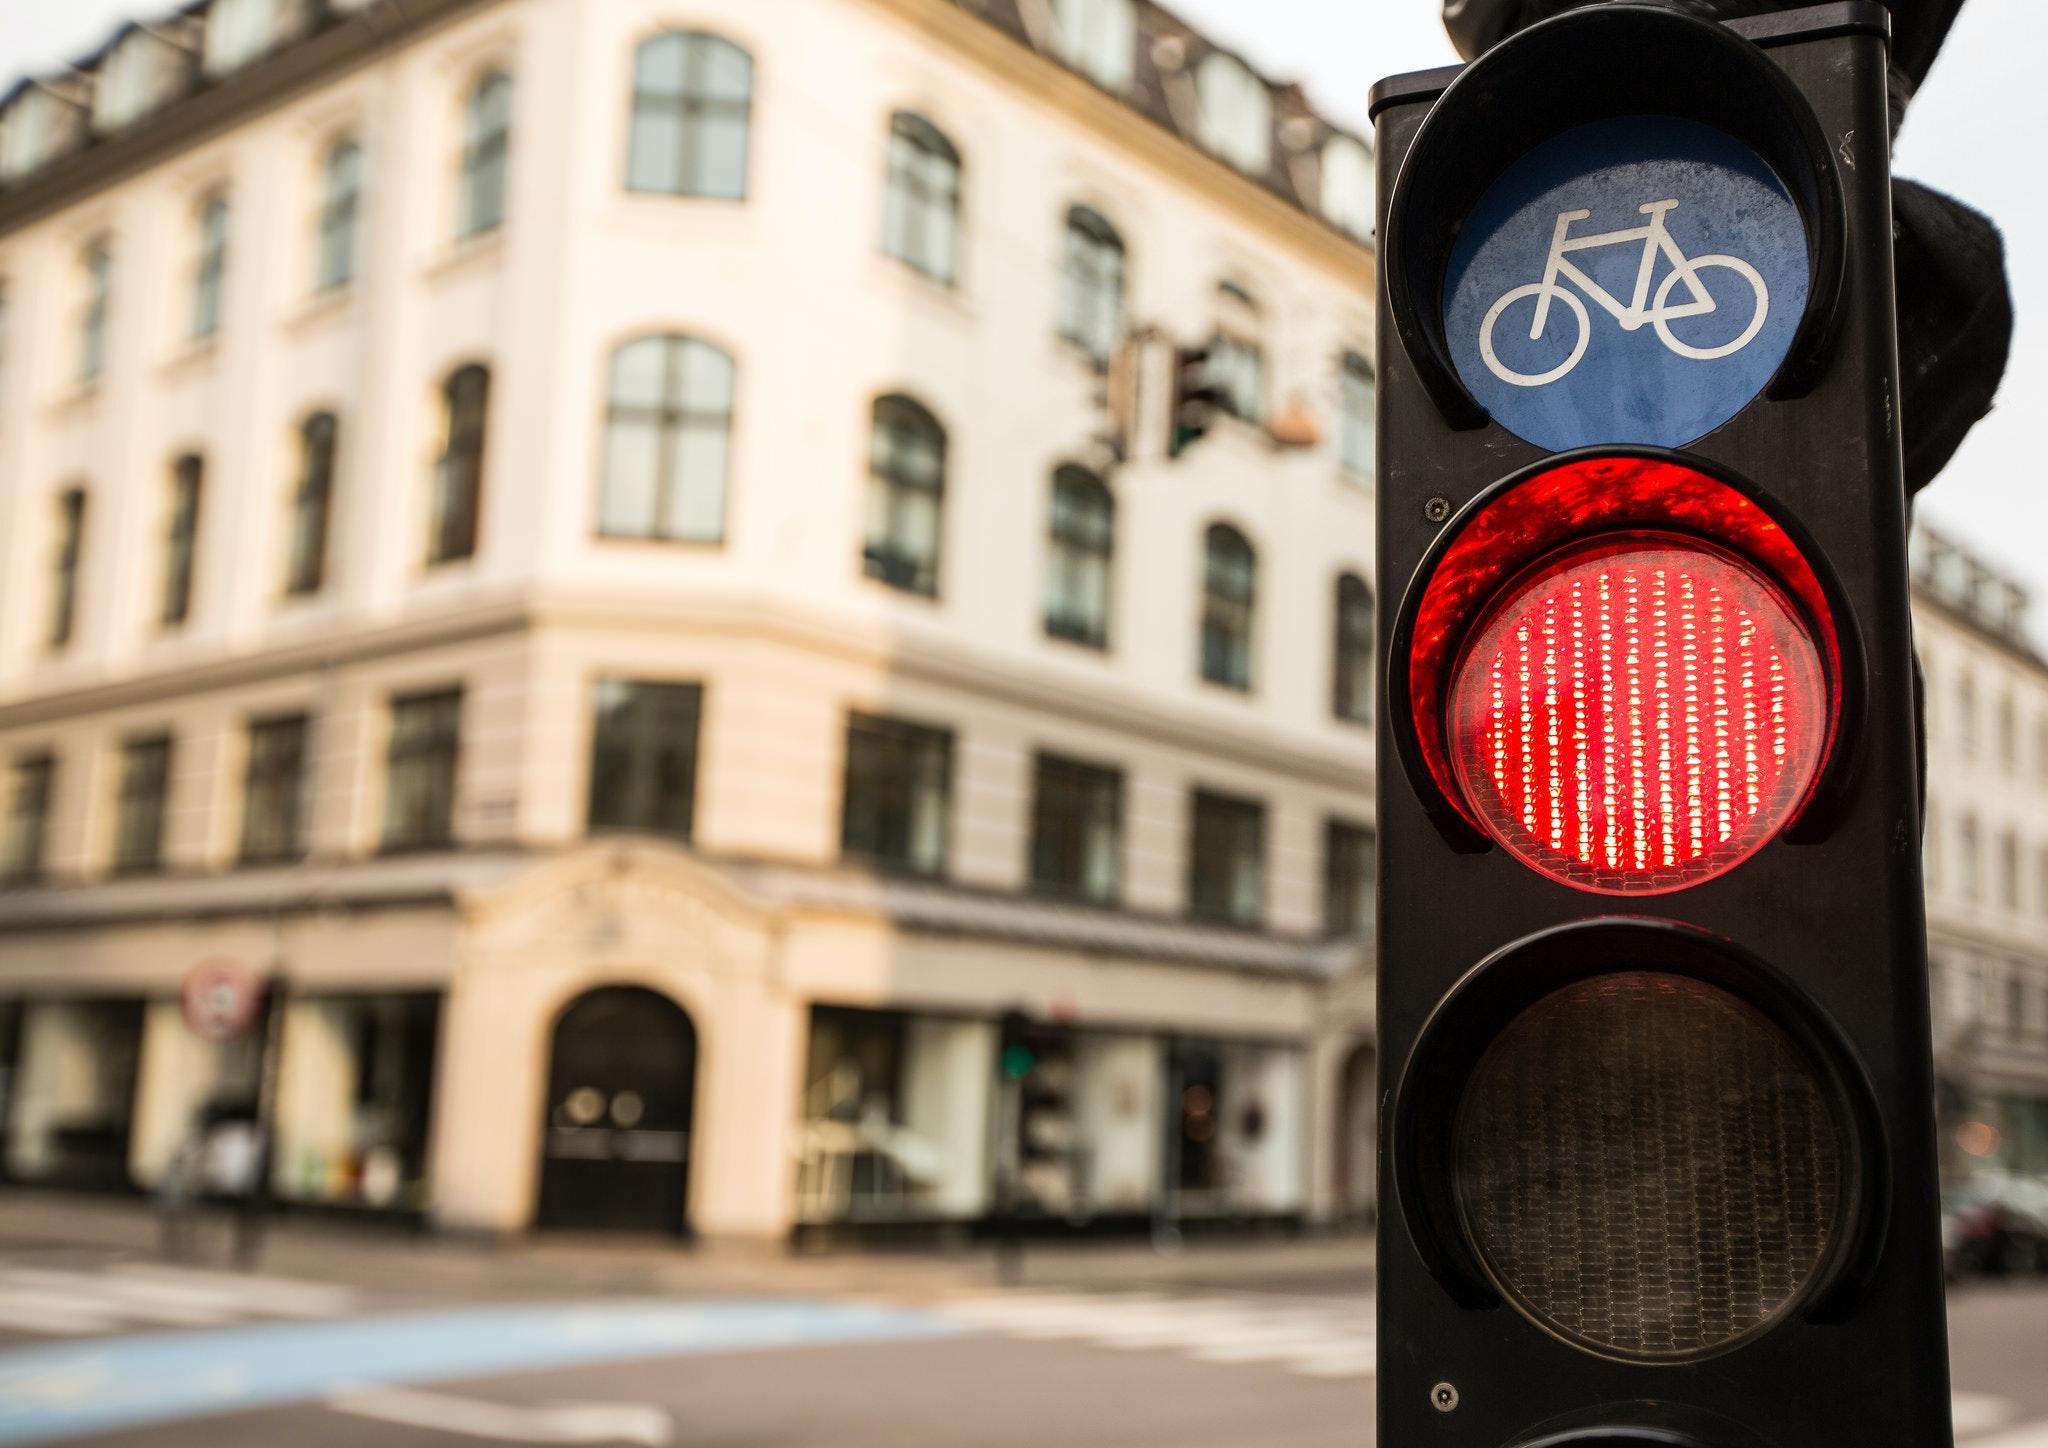 Red traffic light, urban, city